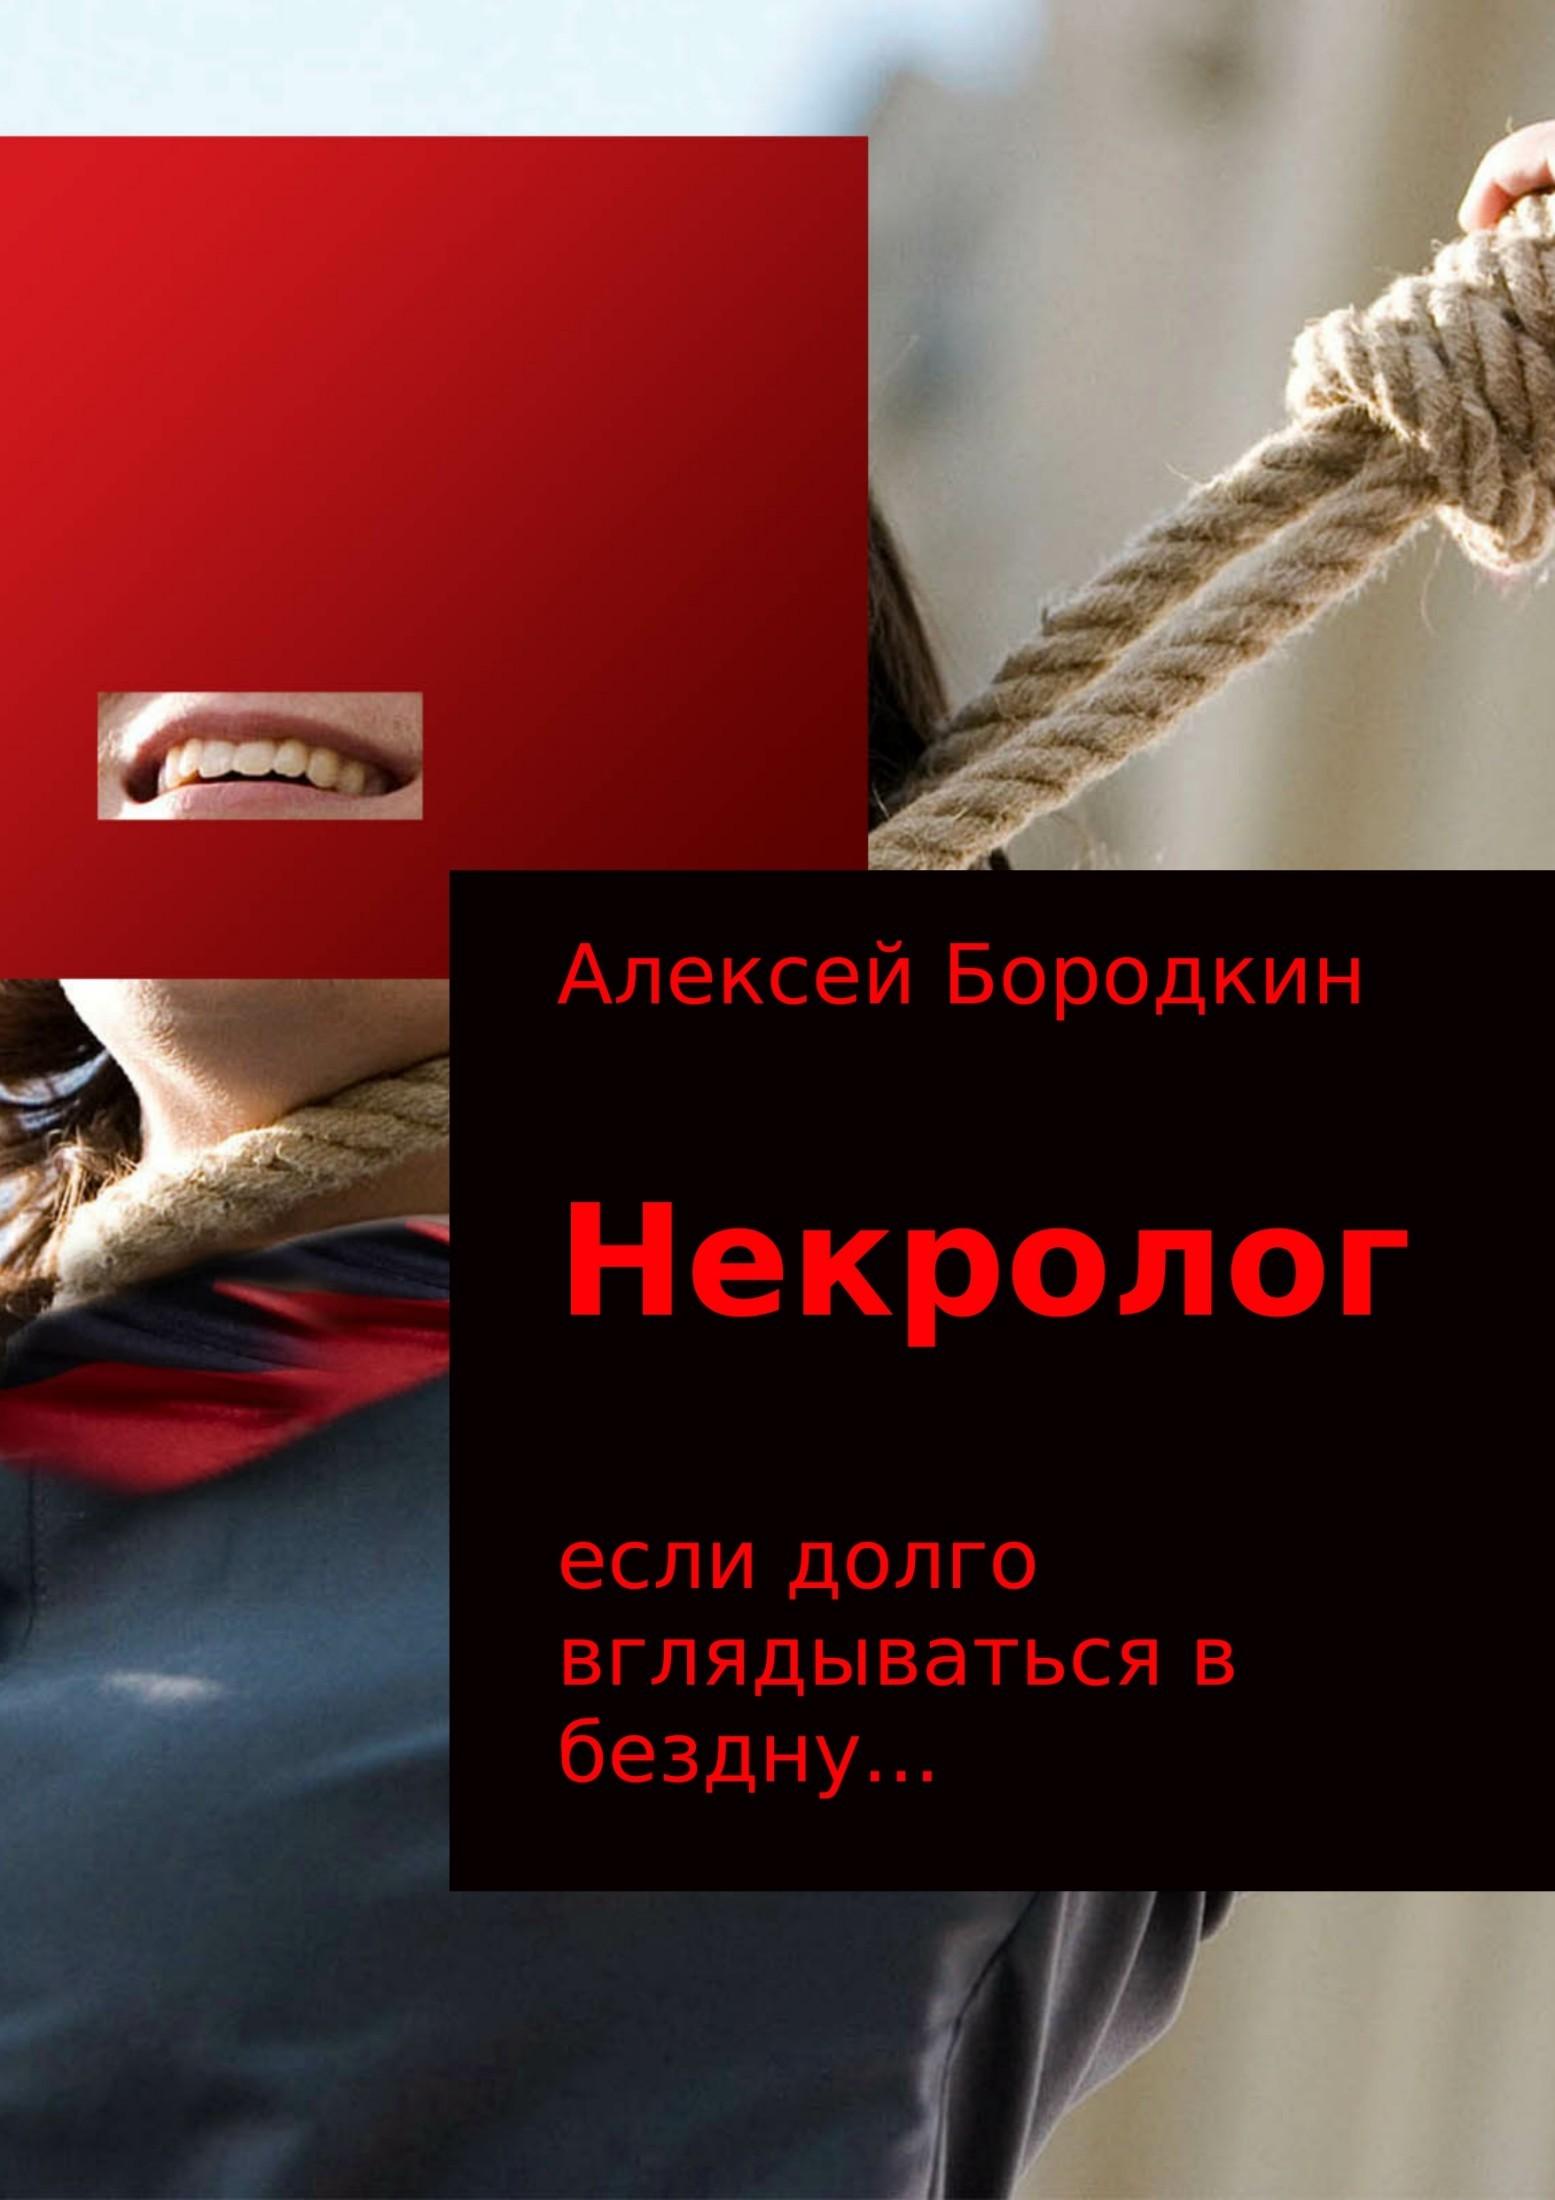 Алексей Бородкин - Некролог